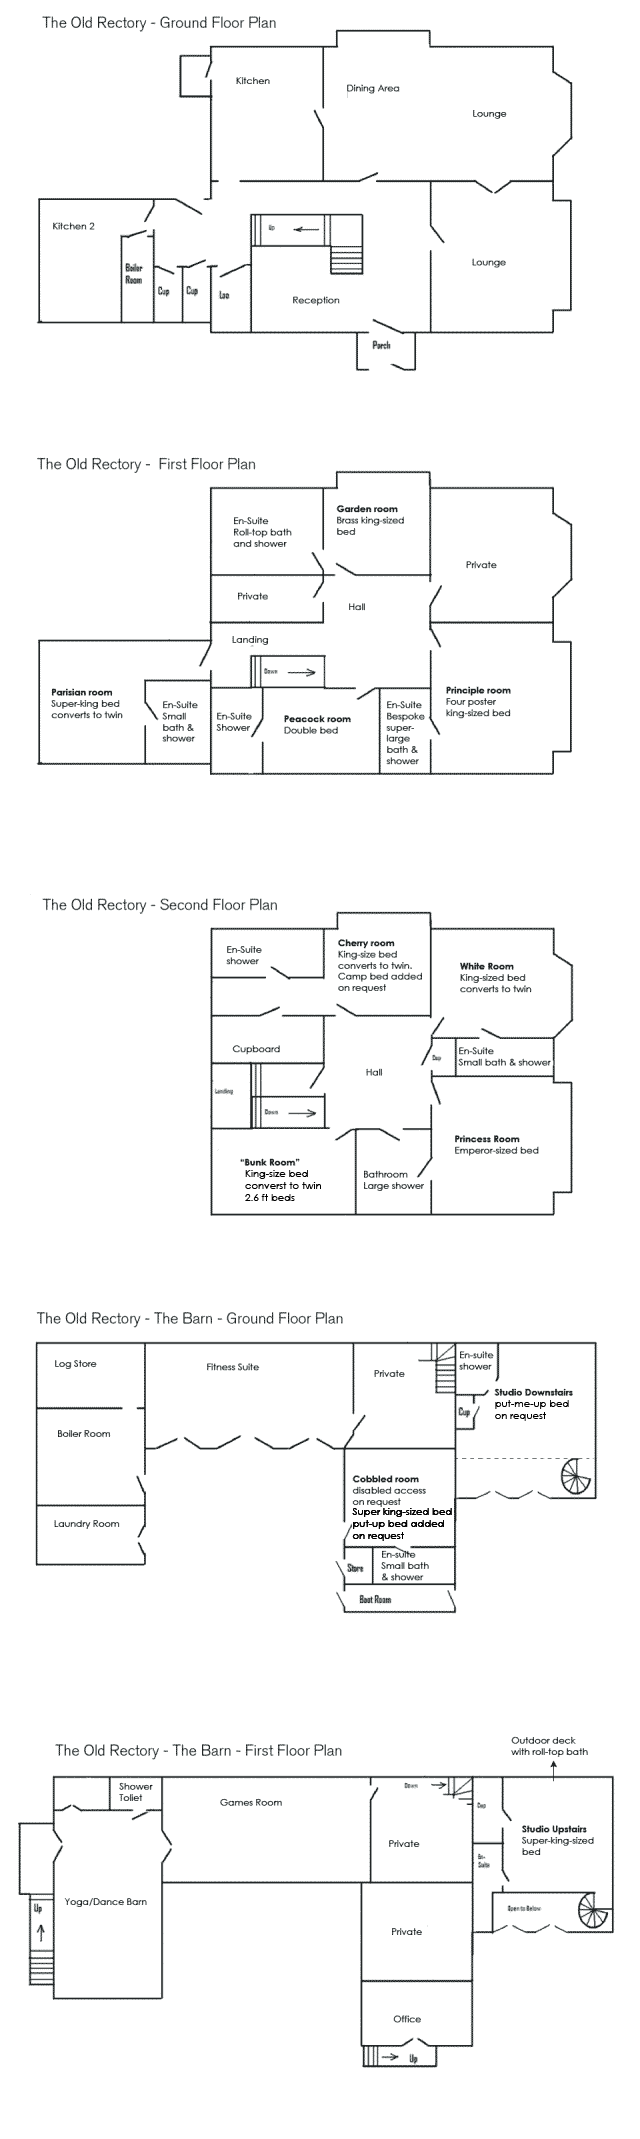 the-old-rectory-floor-plan-2021